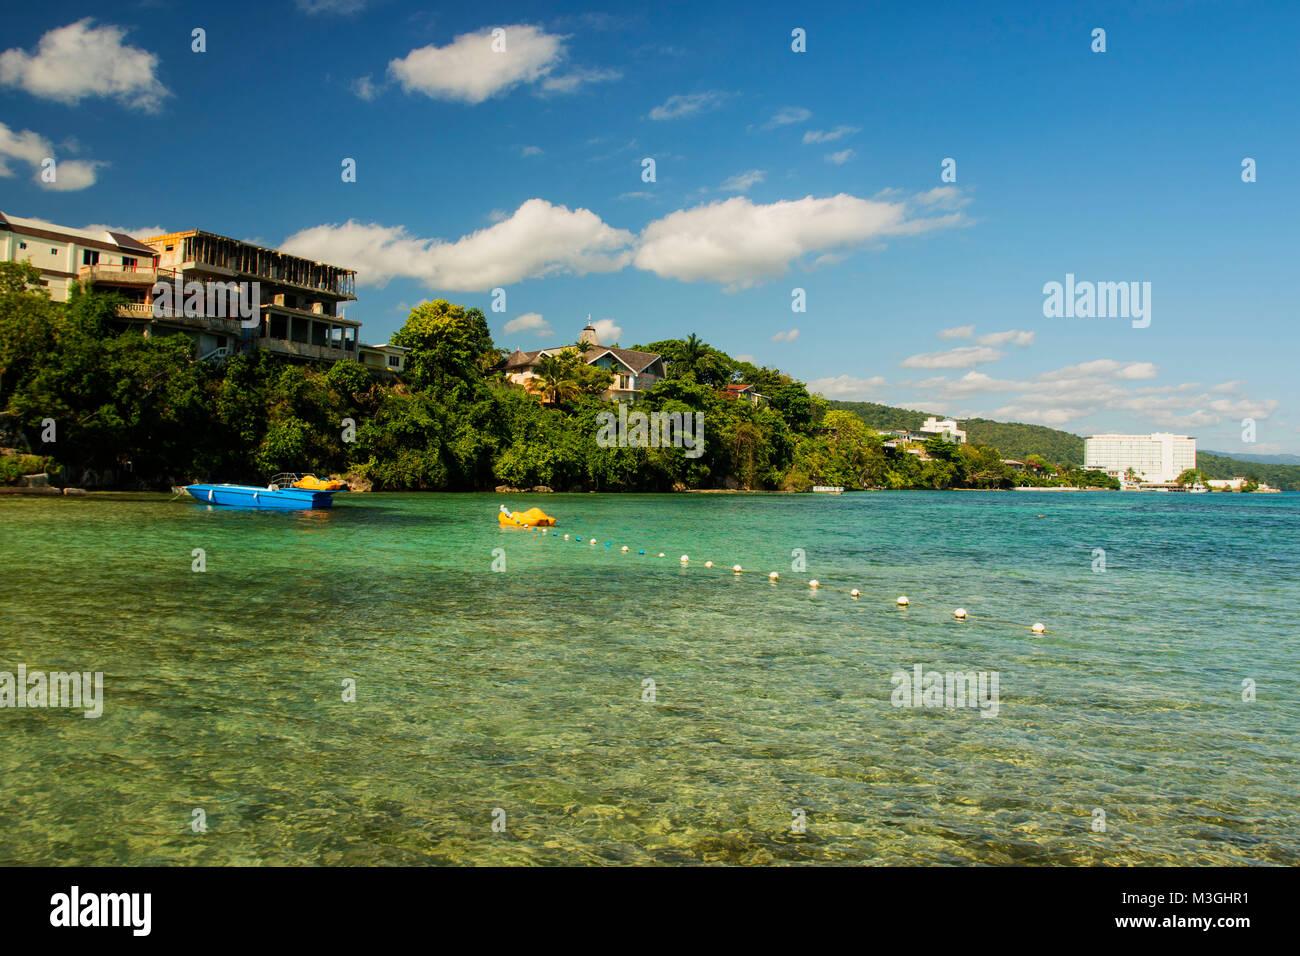 Mahogany Beach seascape avec bleu bateau sur une mer calme, Ocho Rios, Jamaïque, Antilles, Caraïbes Banque D'Images